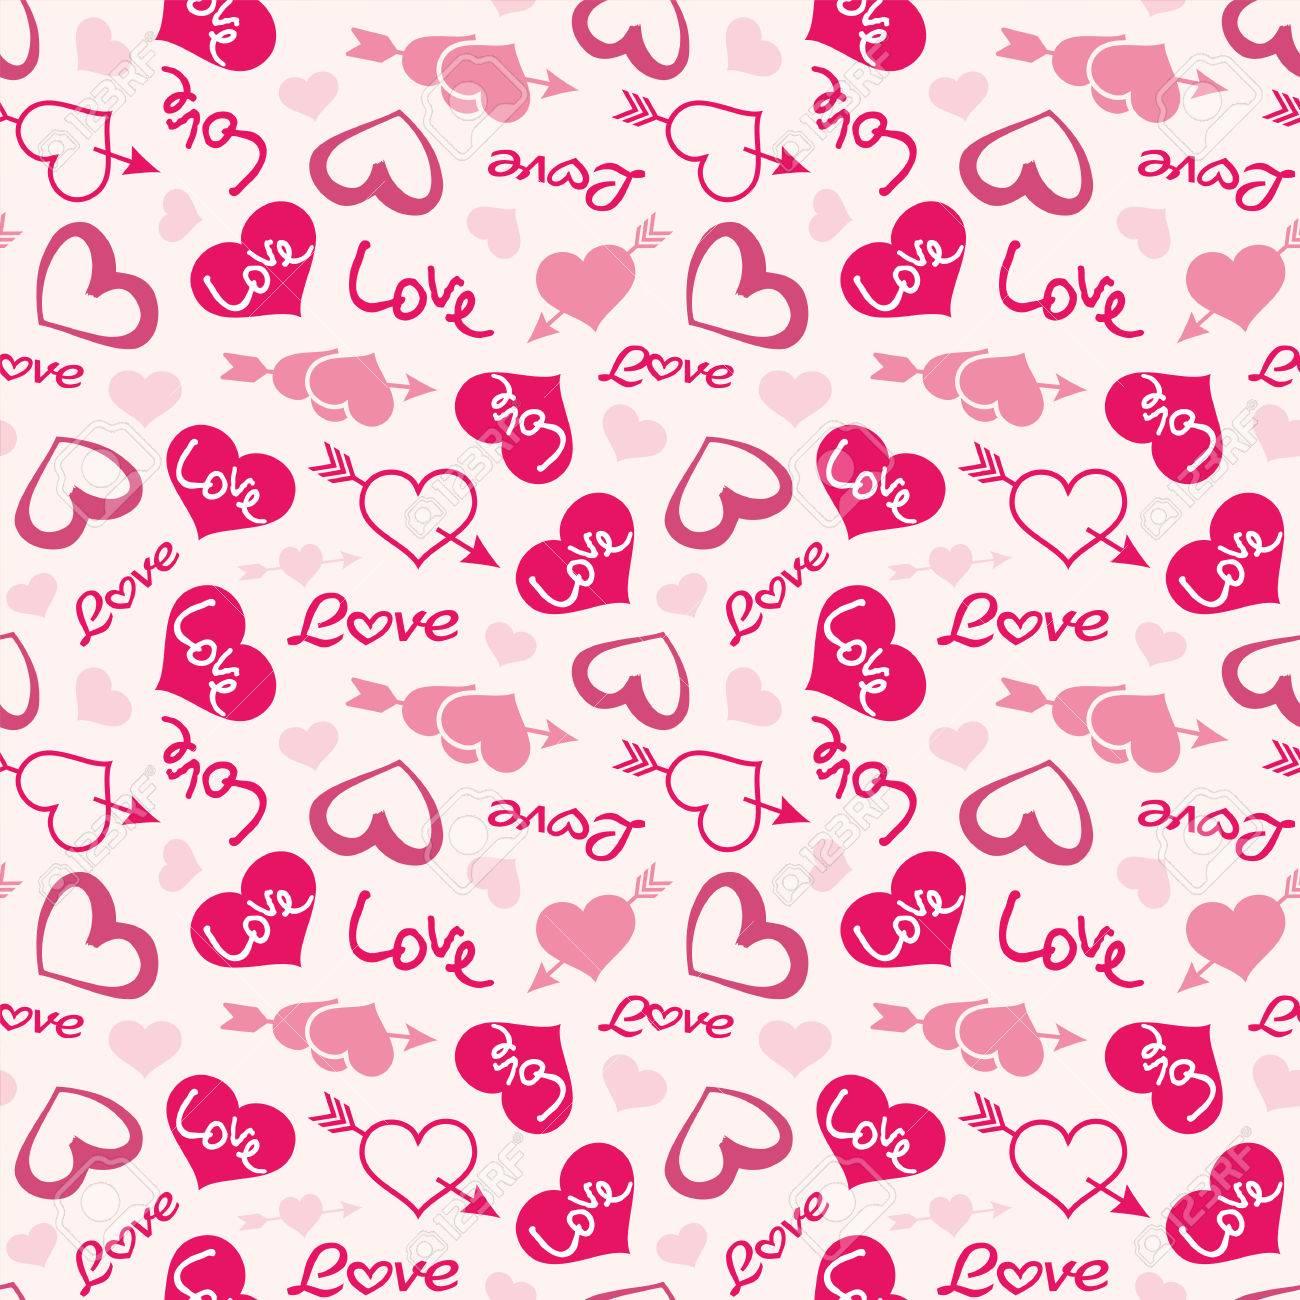 Love theme hearts valentine's day seamless pattern wallpaper